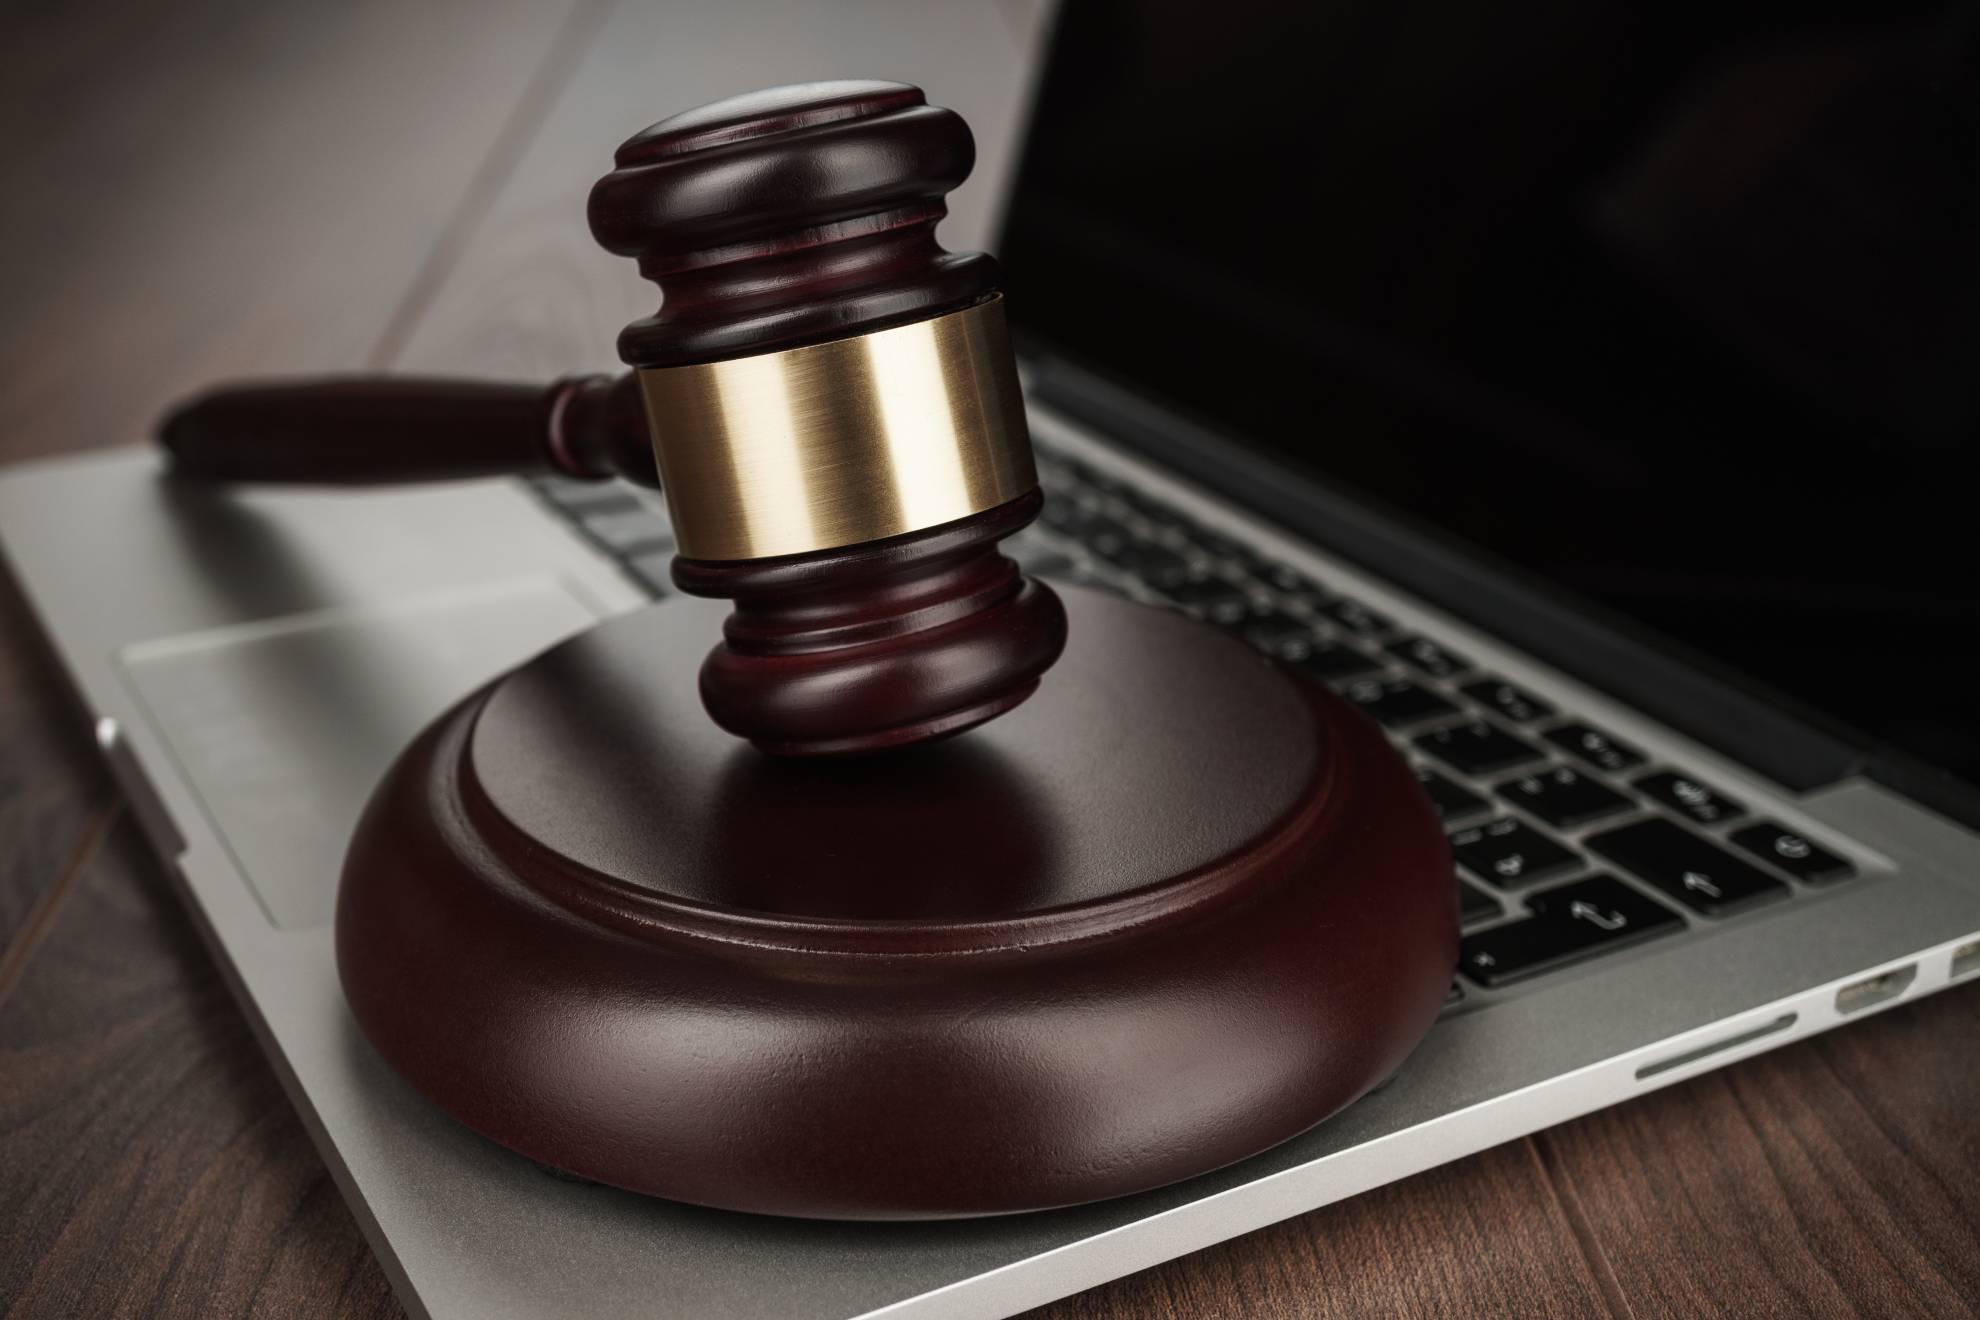 judge-gavel-on-laptop-concept-XKJBUE3 (1)